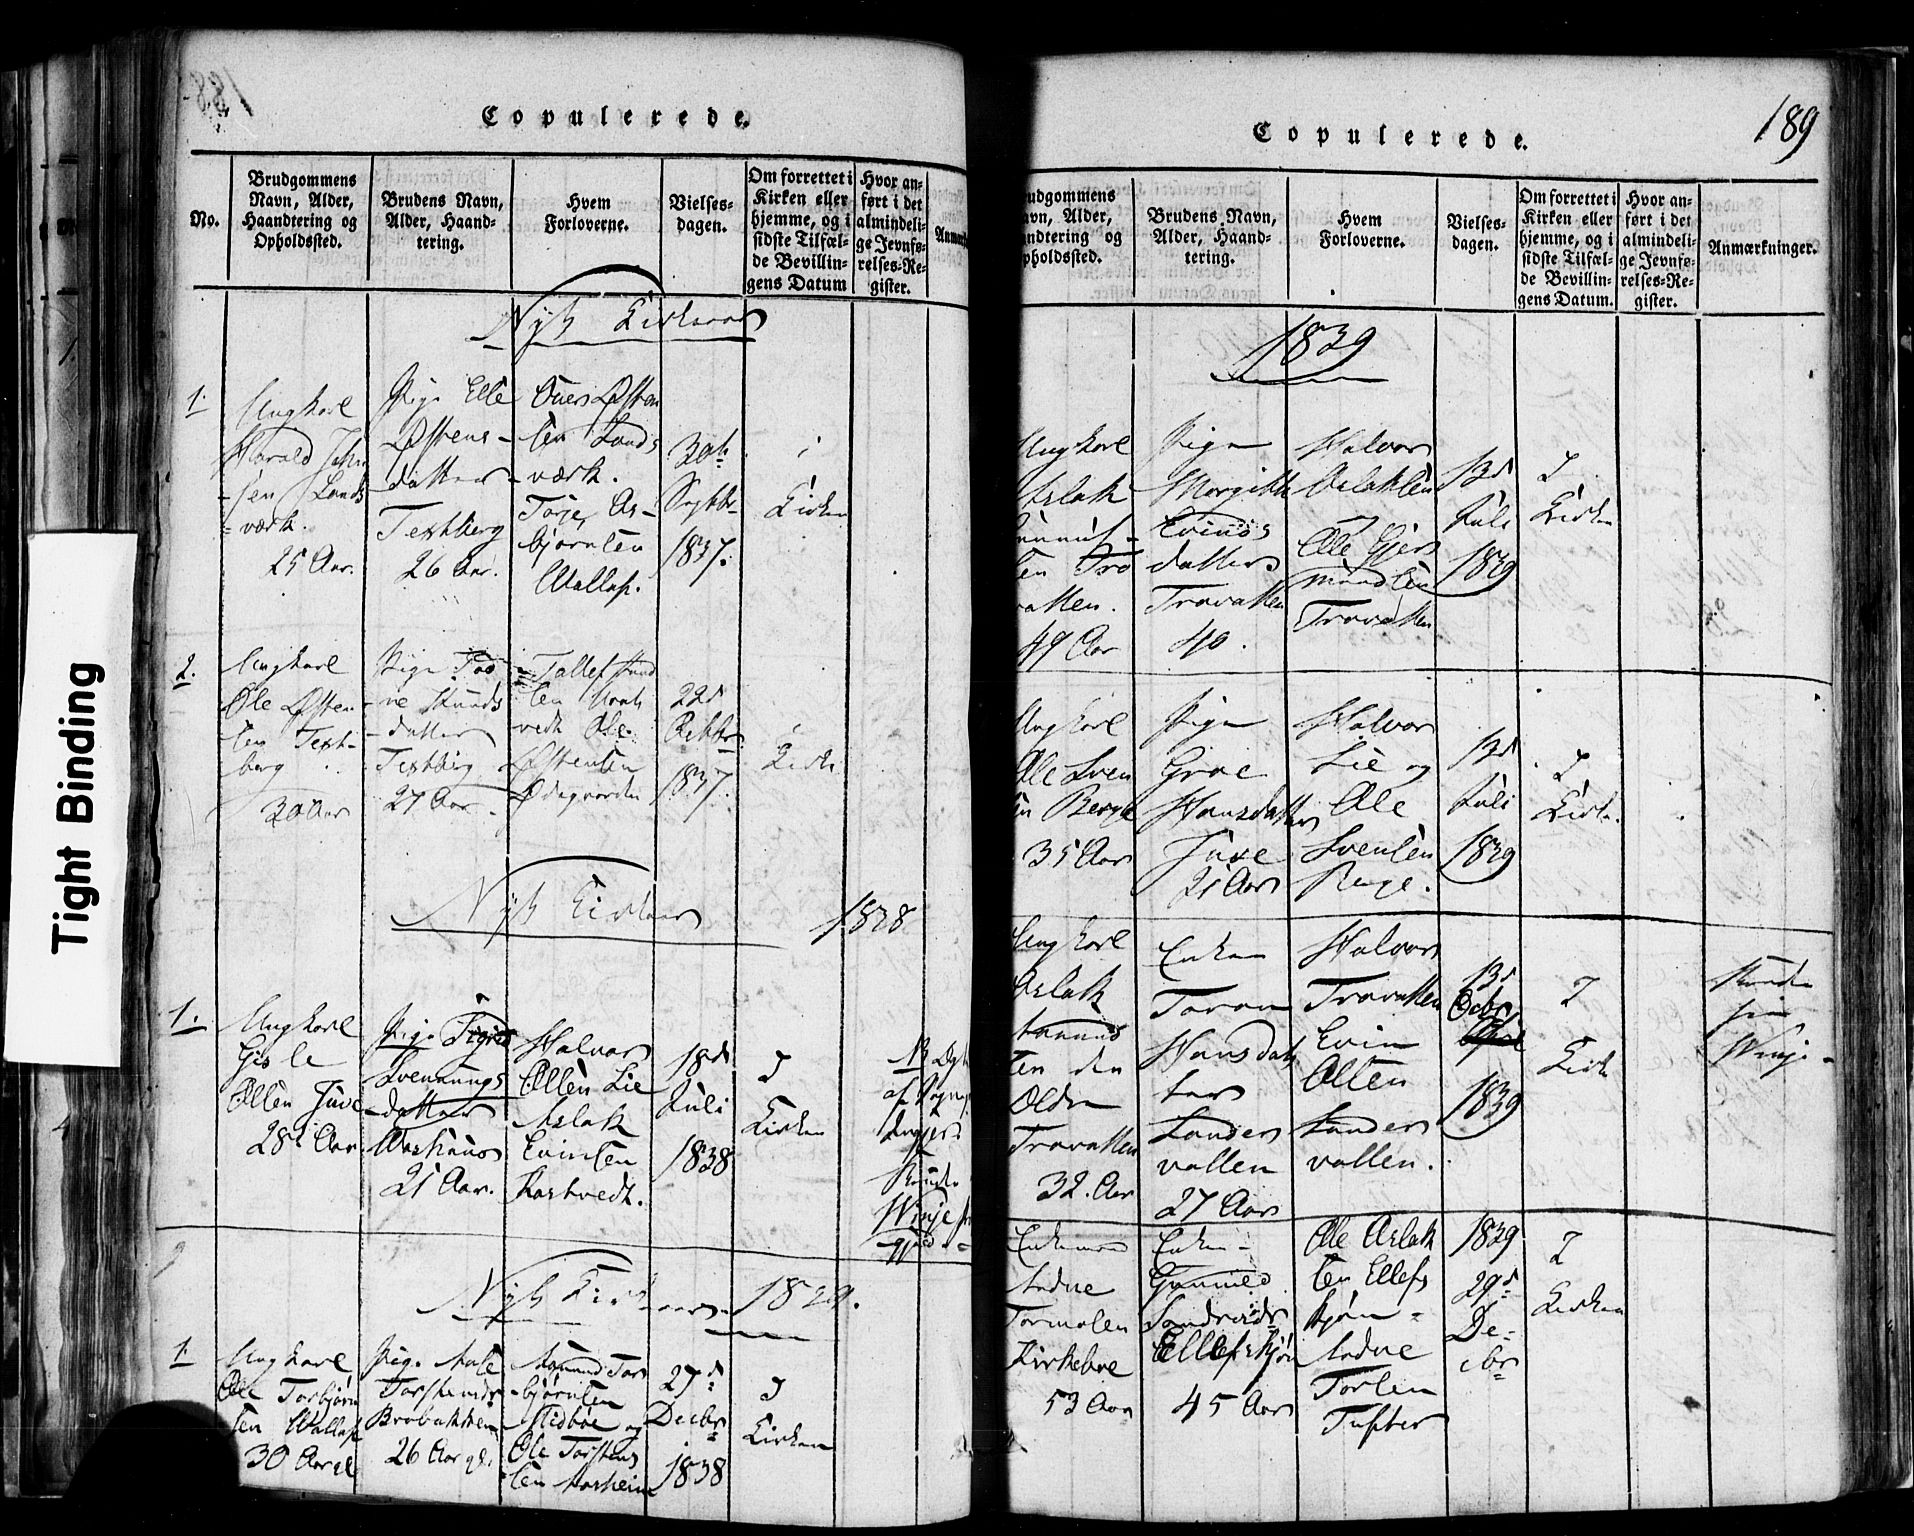 SAKO, Rauland kirkebøker, F/Fa/L0002: Ministerialbok nr. 2, 1815-1860, s. 189